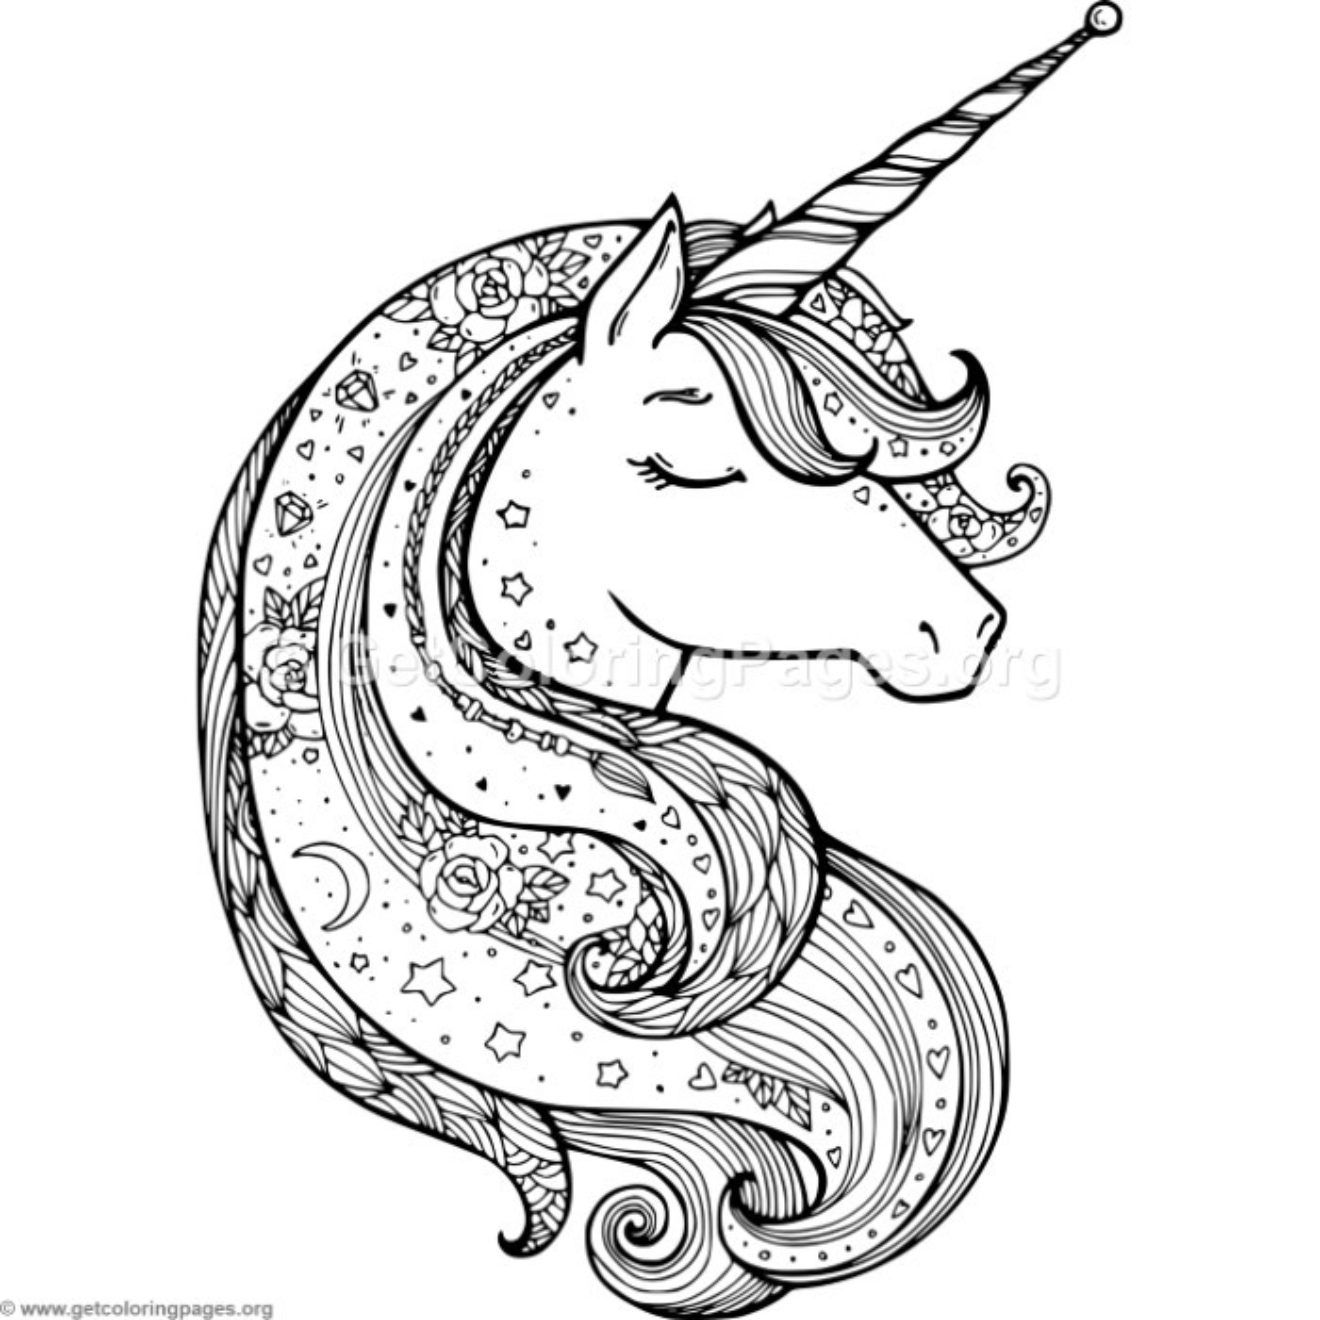 Zentangle Unicorn Coloring Pages Unicorn Coloring Pages Animal Coloring Pages Unicorn Pictures